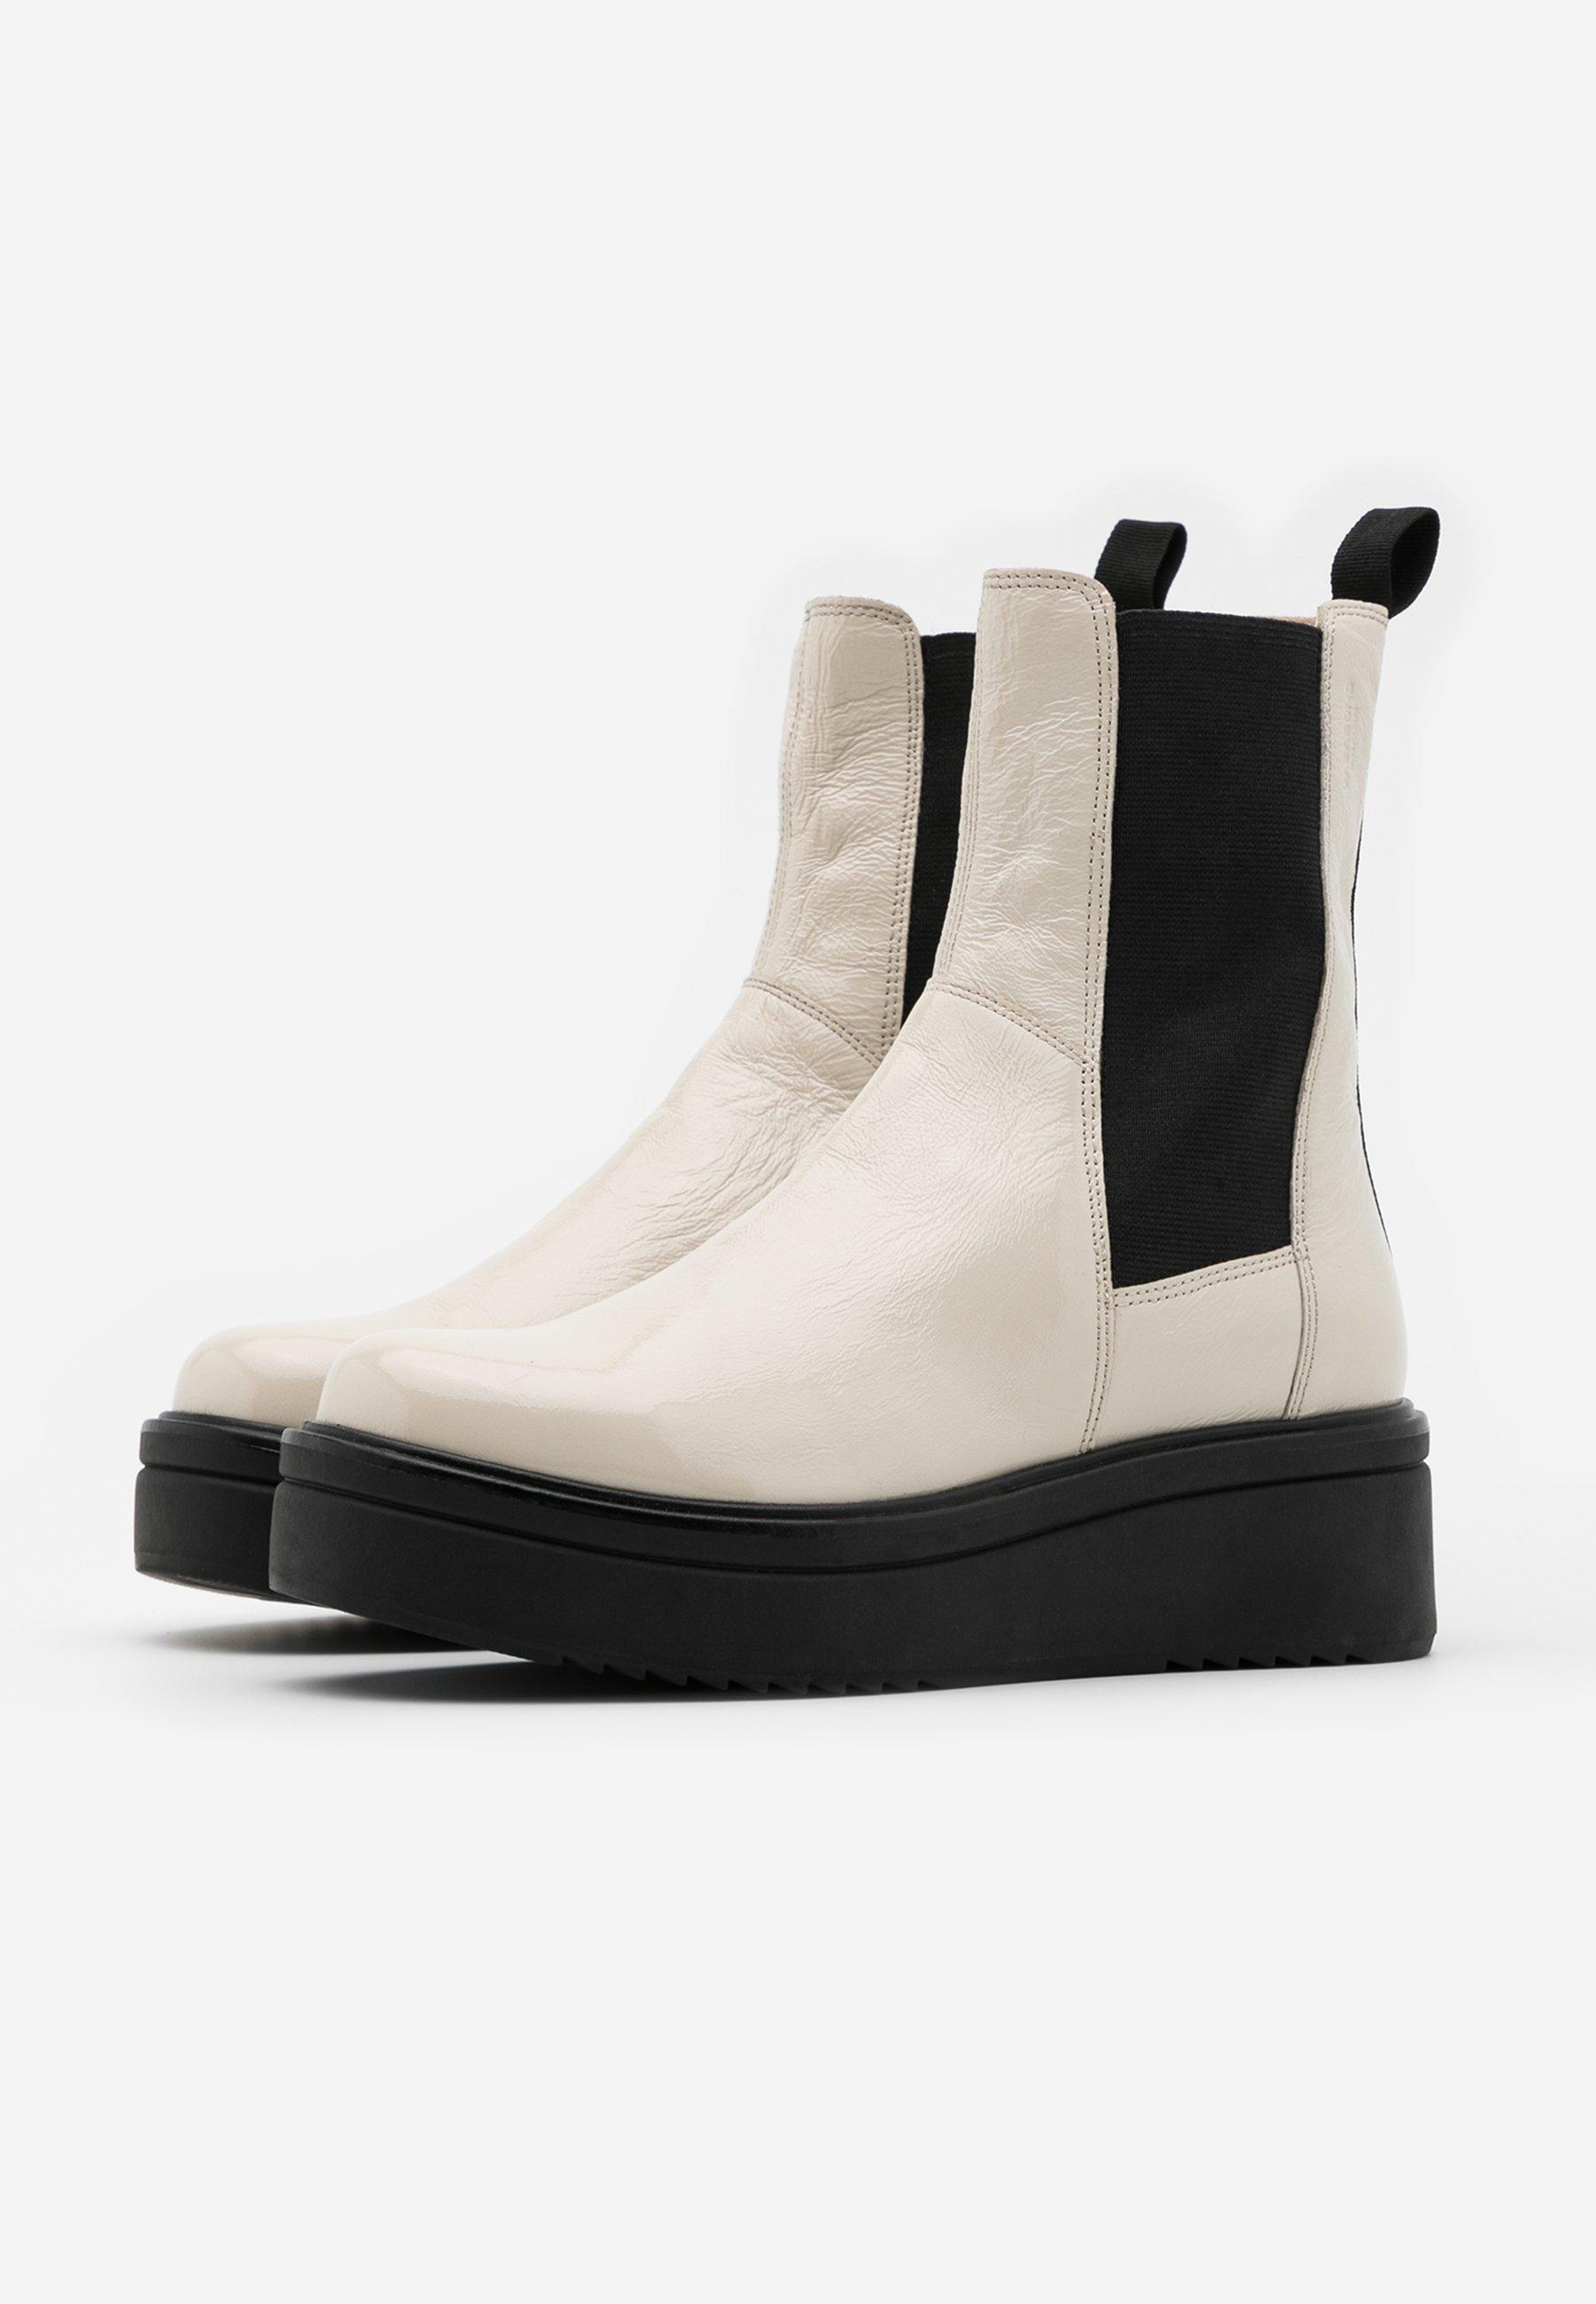 Vagabond TARA - Plateaustiefelette - plaster | Damen Schuhe 2020